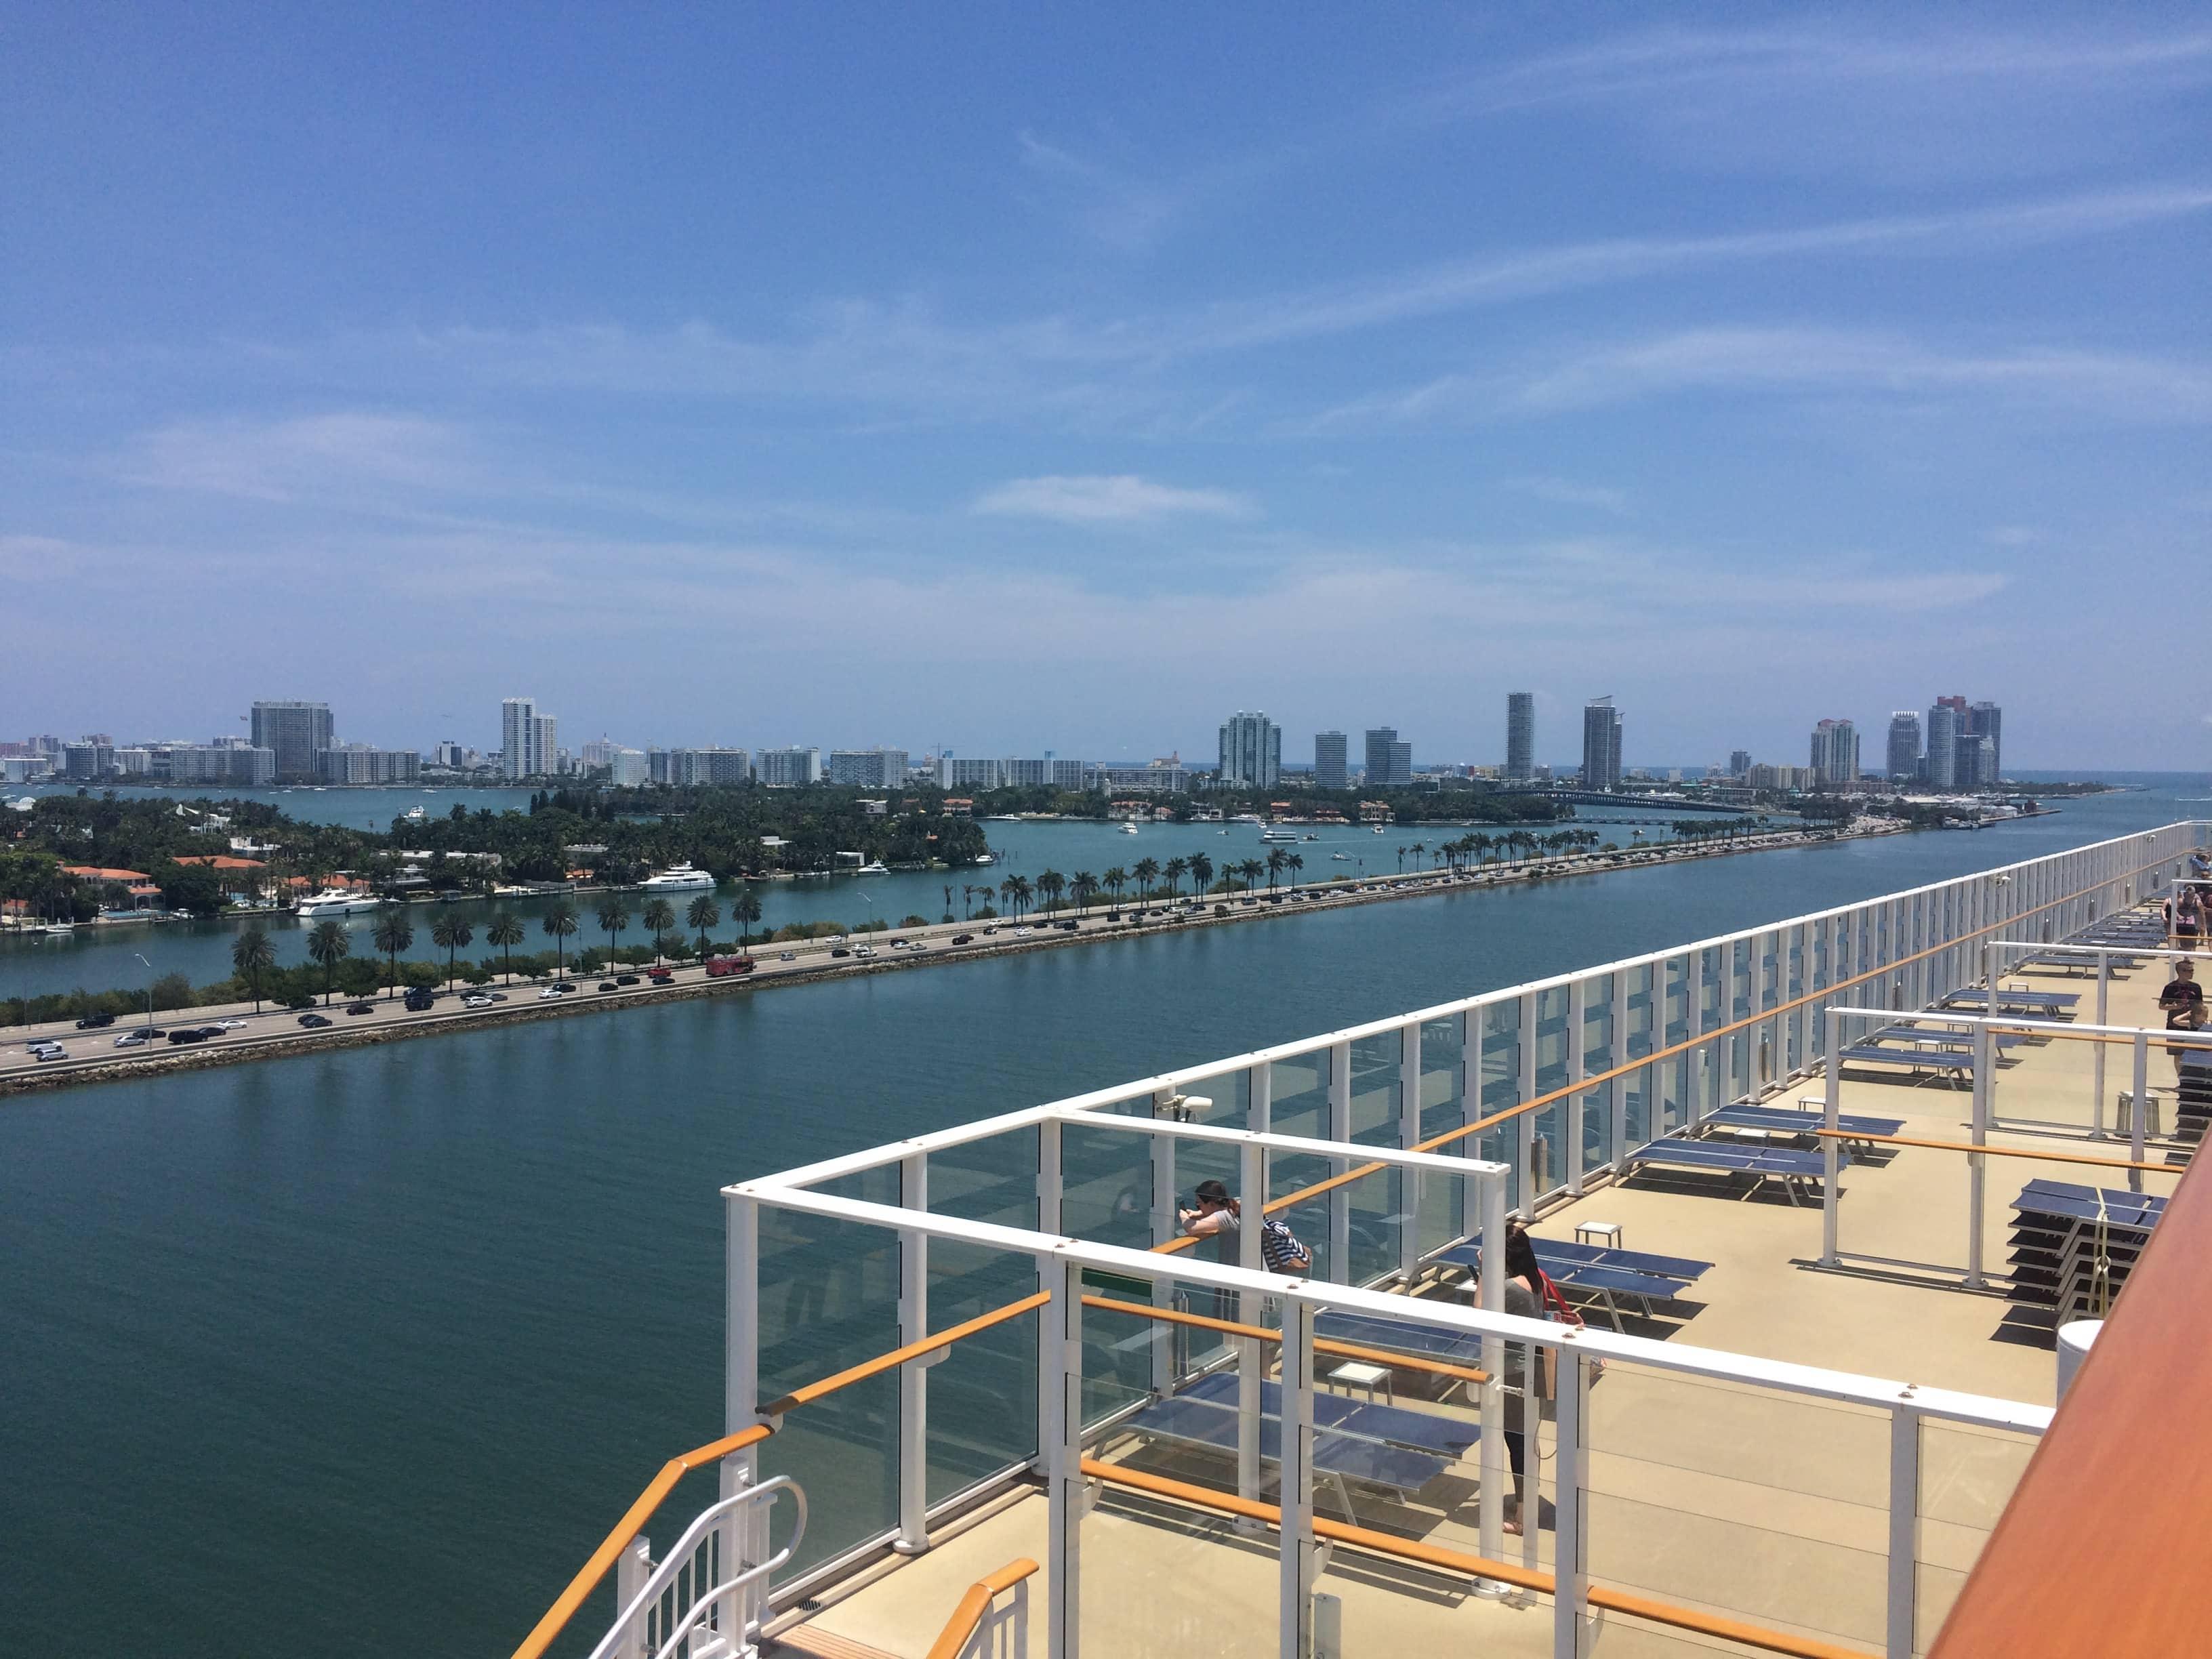 Miami Norwegian Getaway bahamas sail away